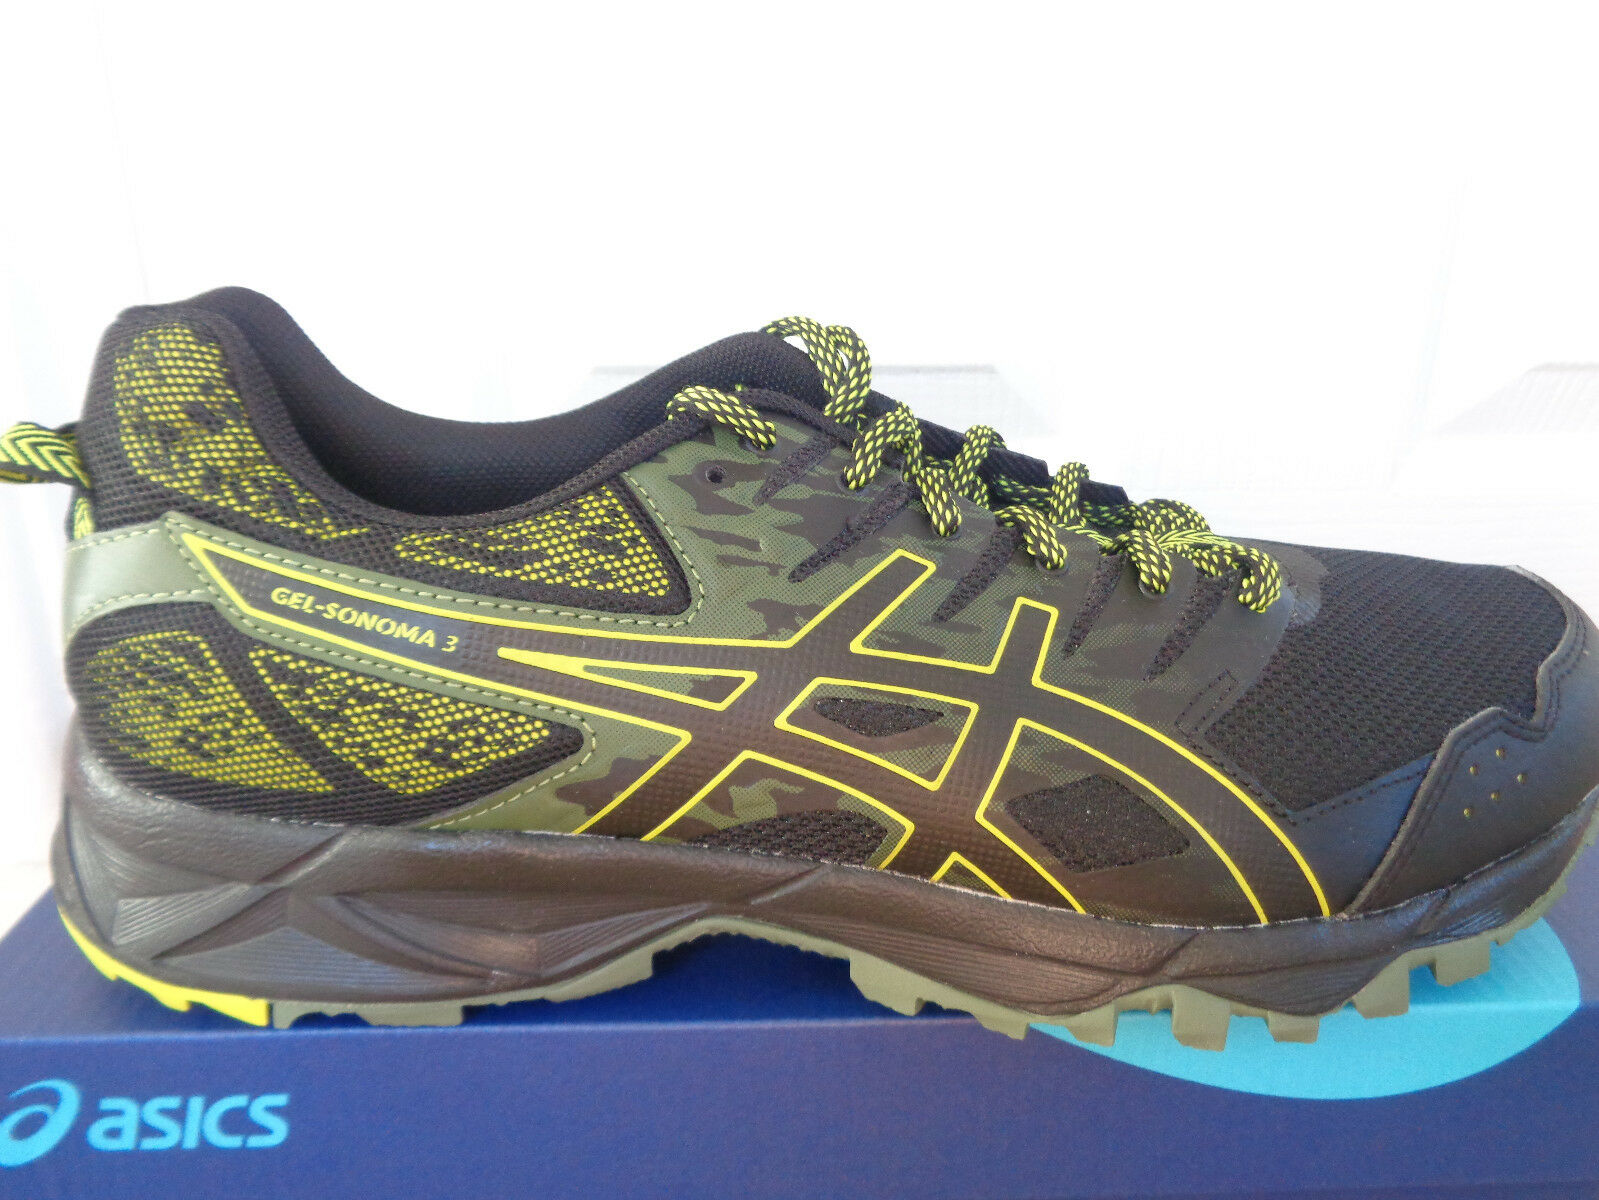 Asics Gel-Sonoma 3 mens trainers T724N 9089 eu 40.5 us 7.5 NEW+BOX